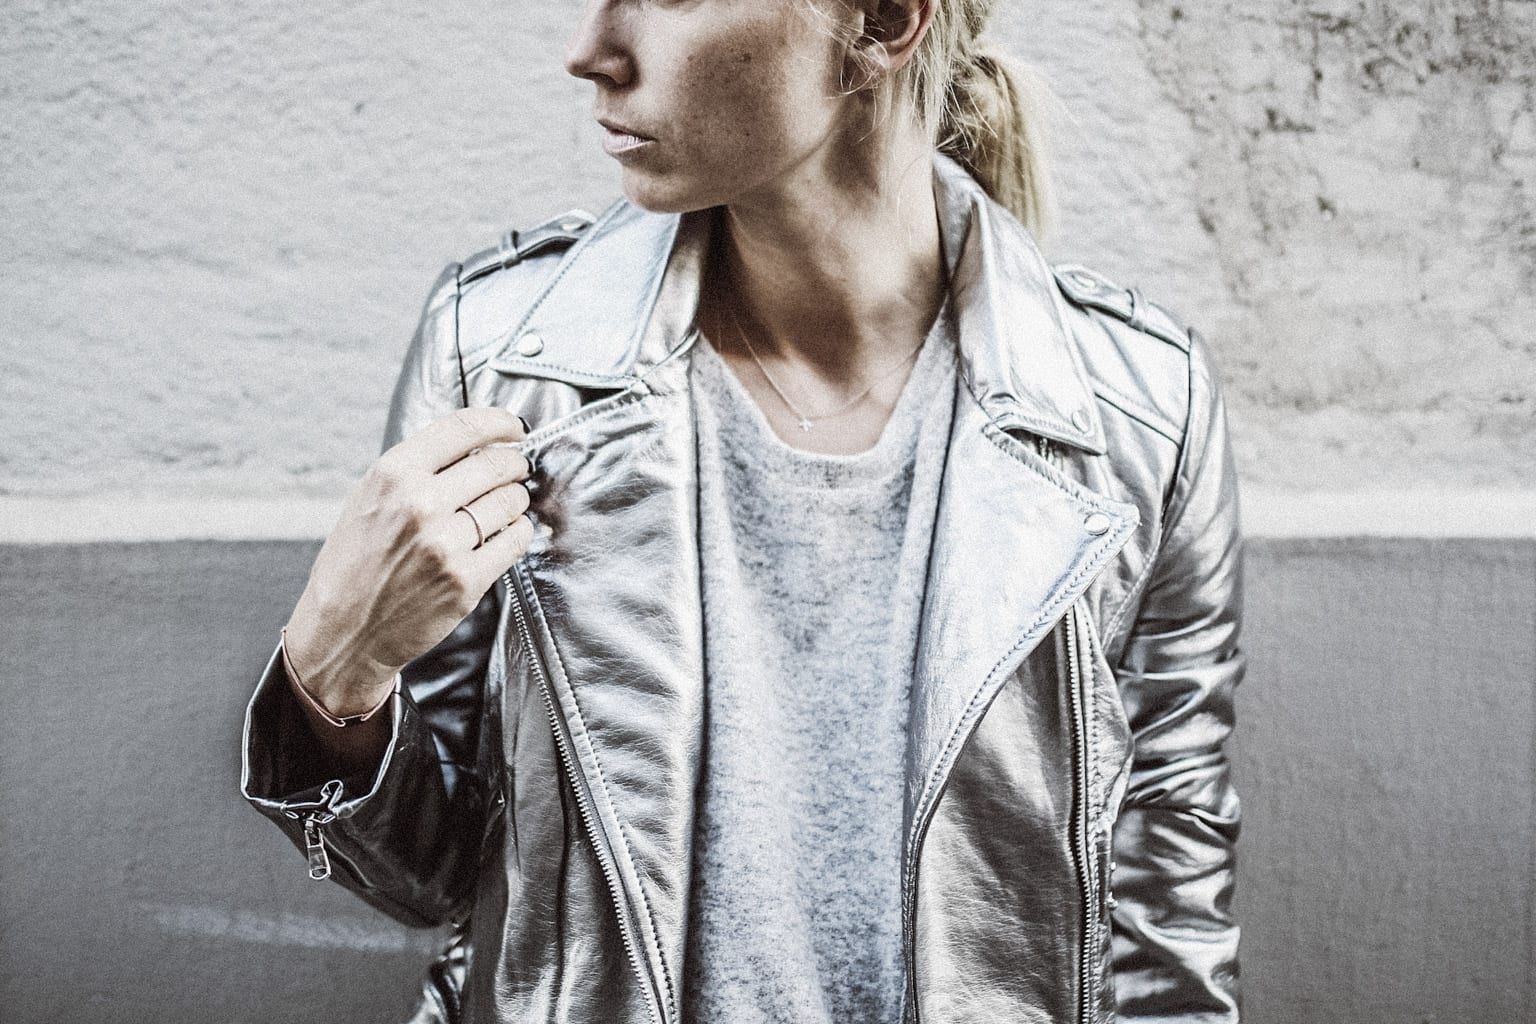 ck-constantlyk-com-karin-kaswurm-street-style-fashion-silver-leather-jacket-plissee-6958